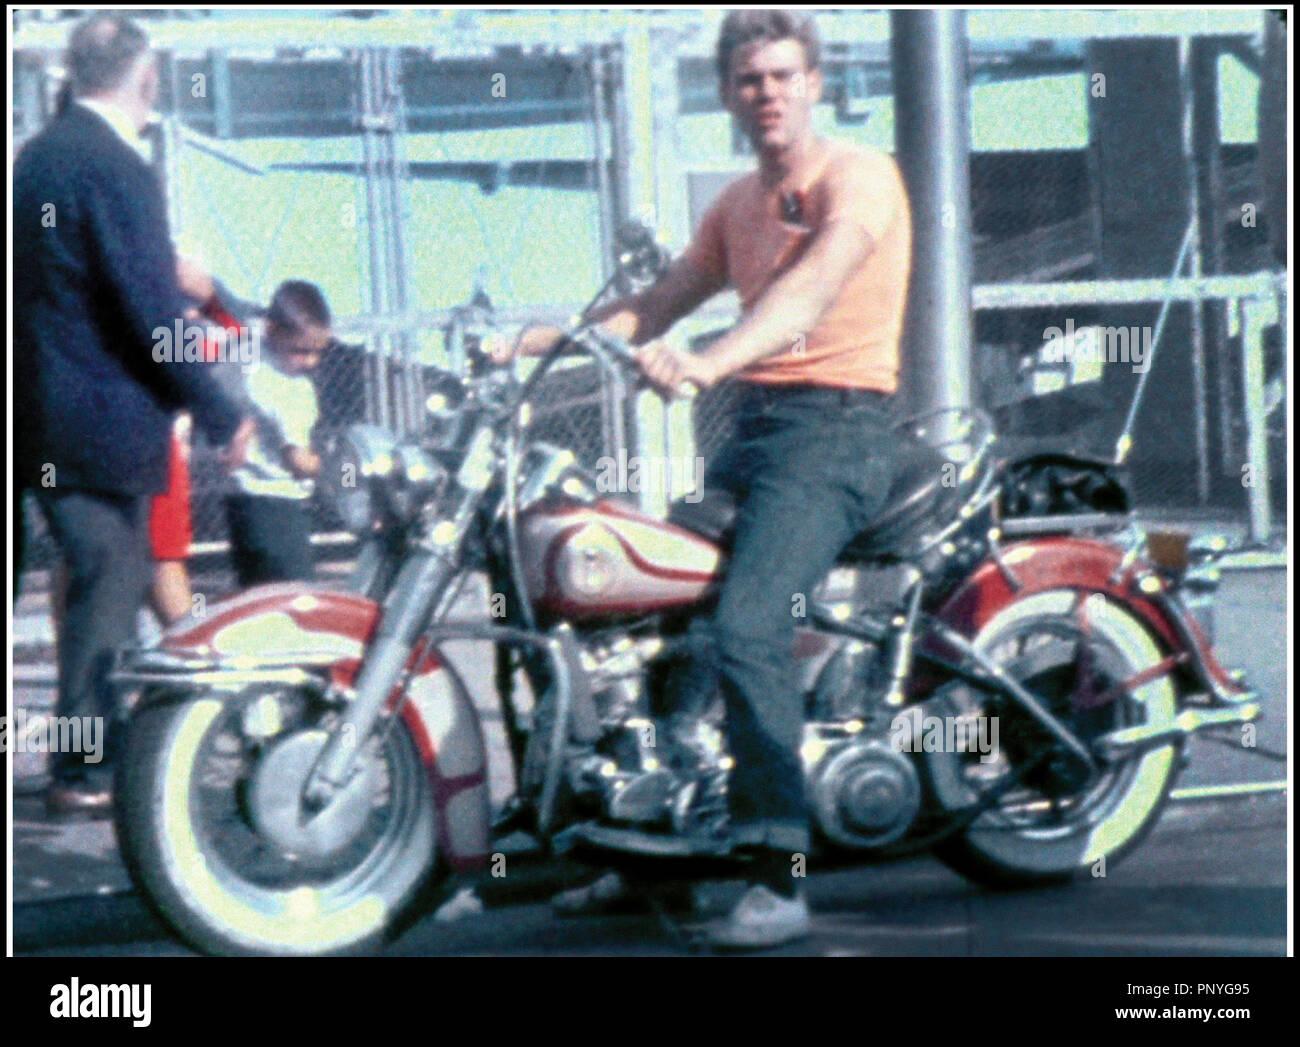 Gay moto